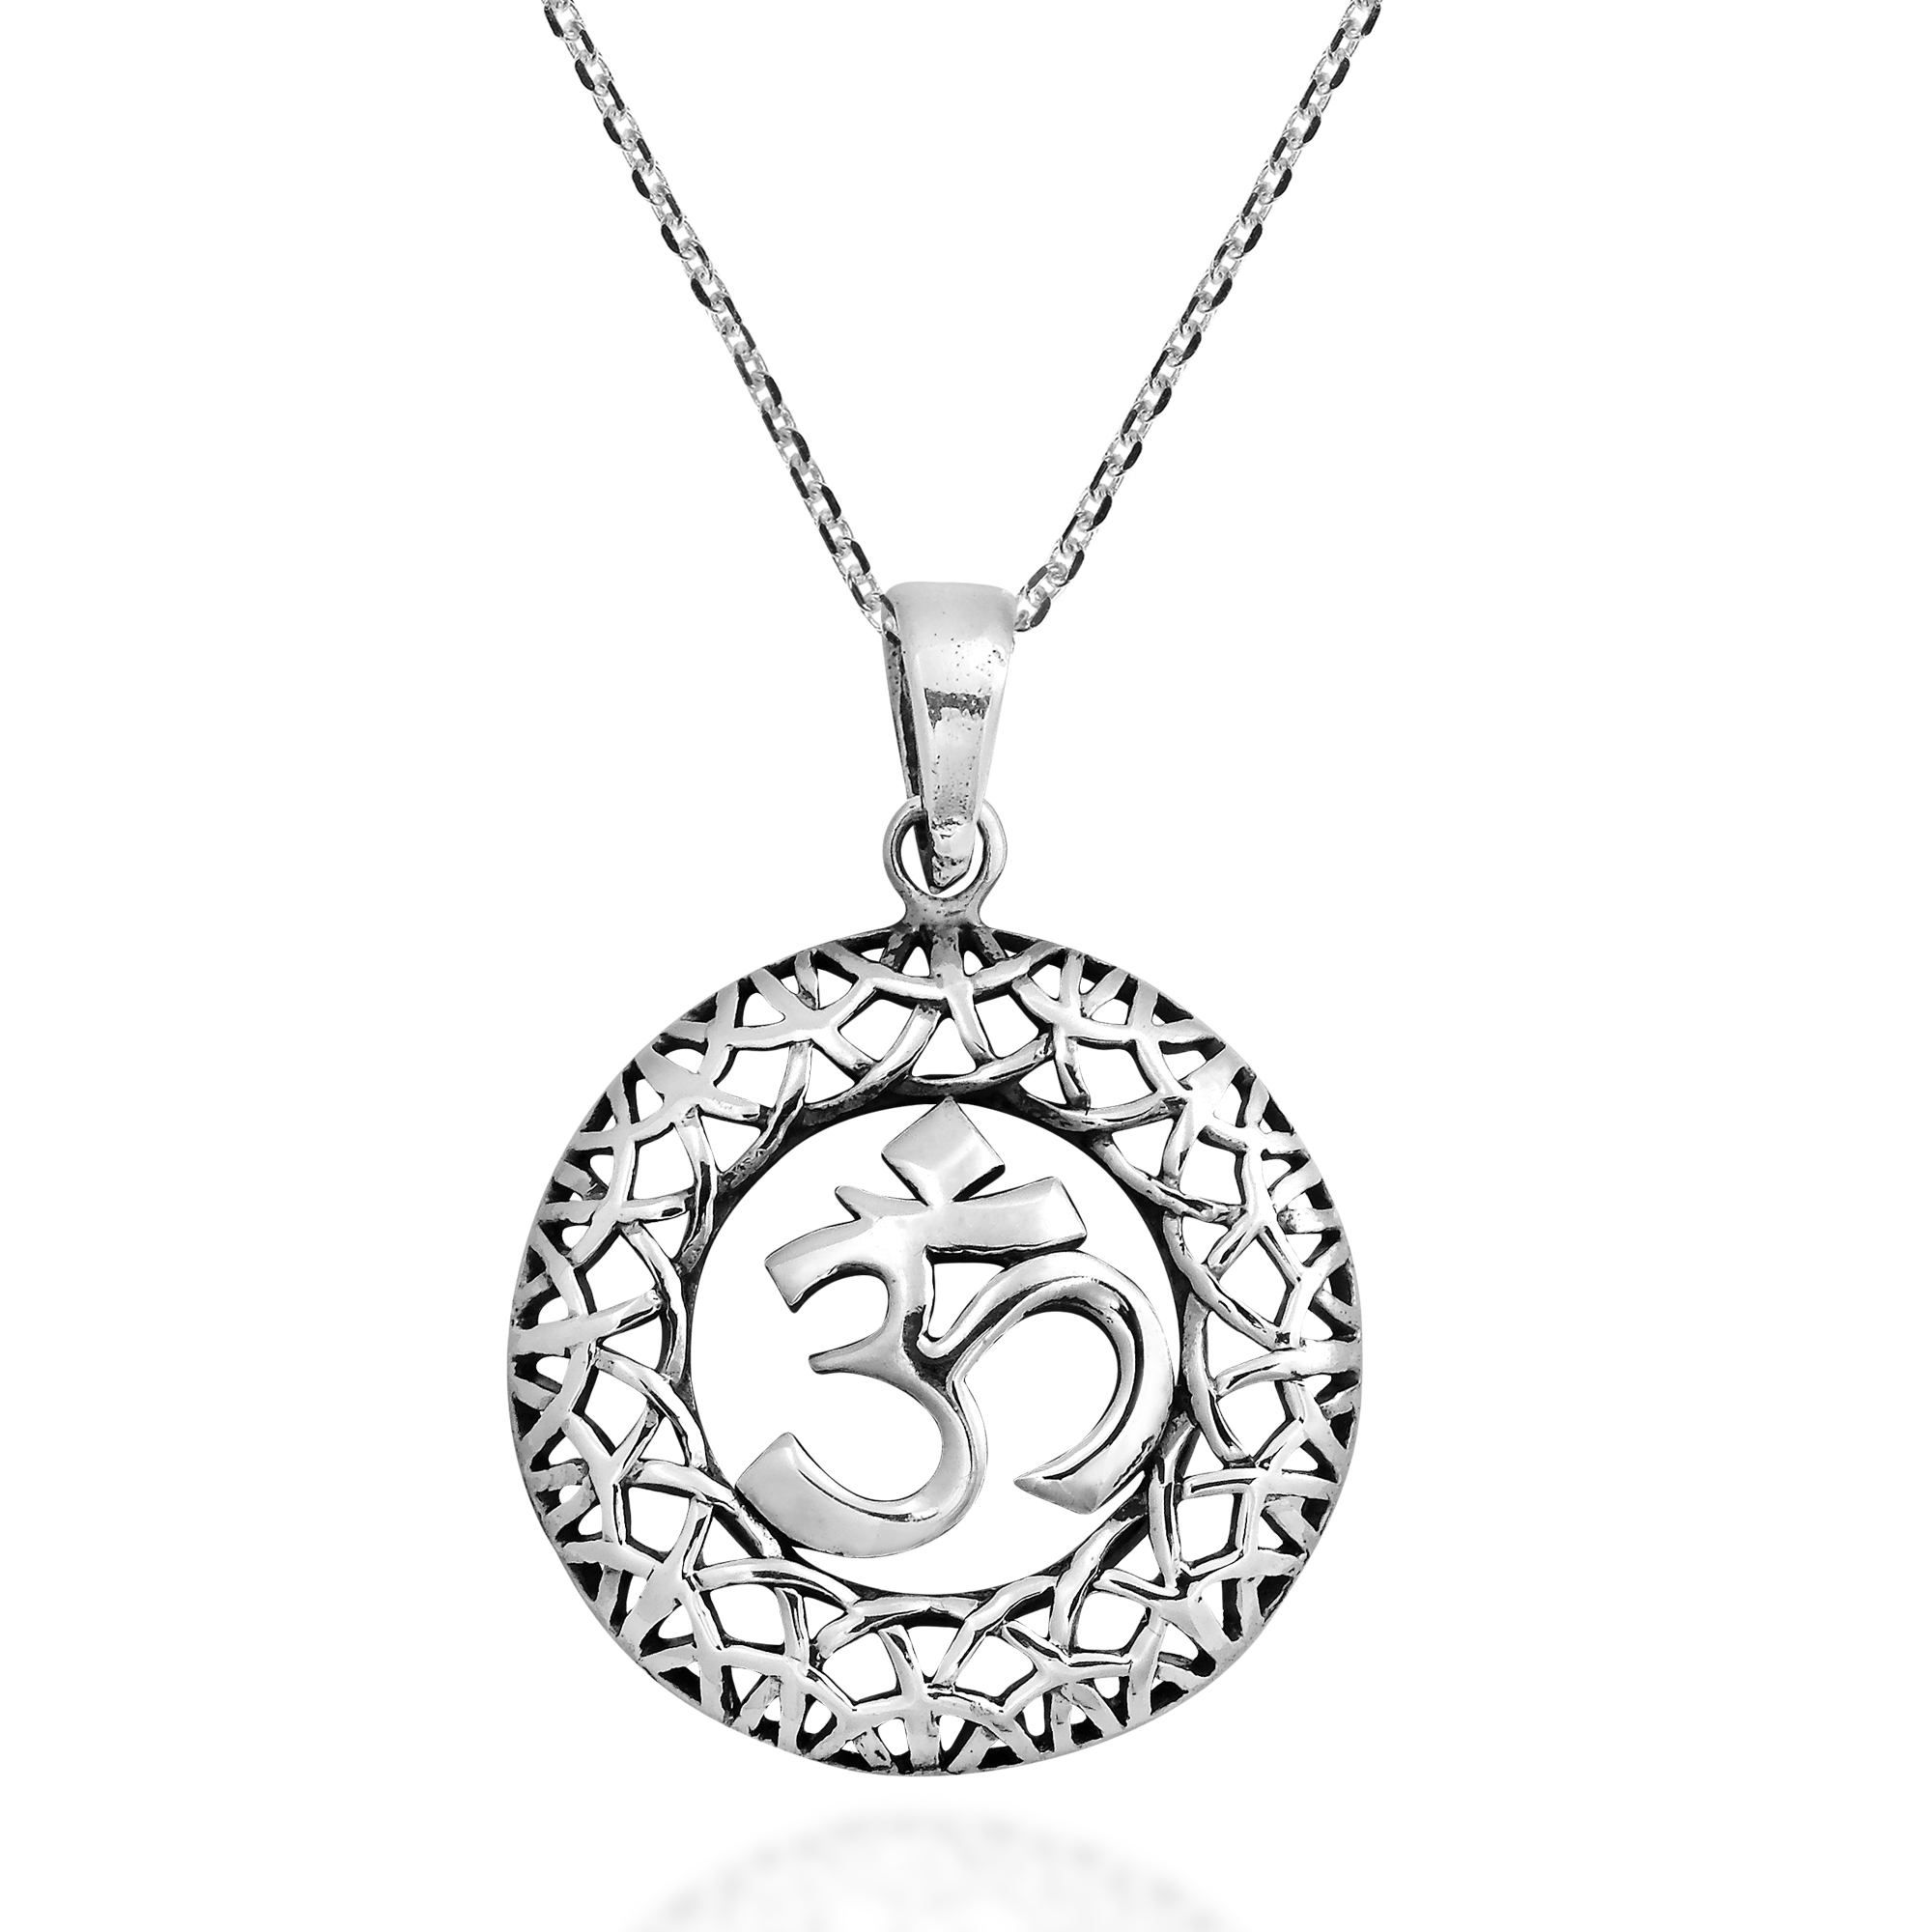 Intricate Weave Aum Or Om Symbol Sterling Silver Necklace Aeravida